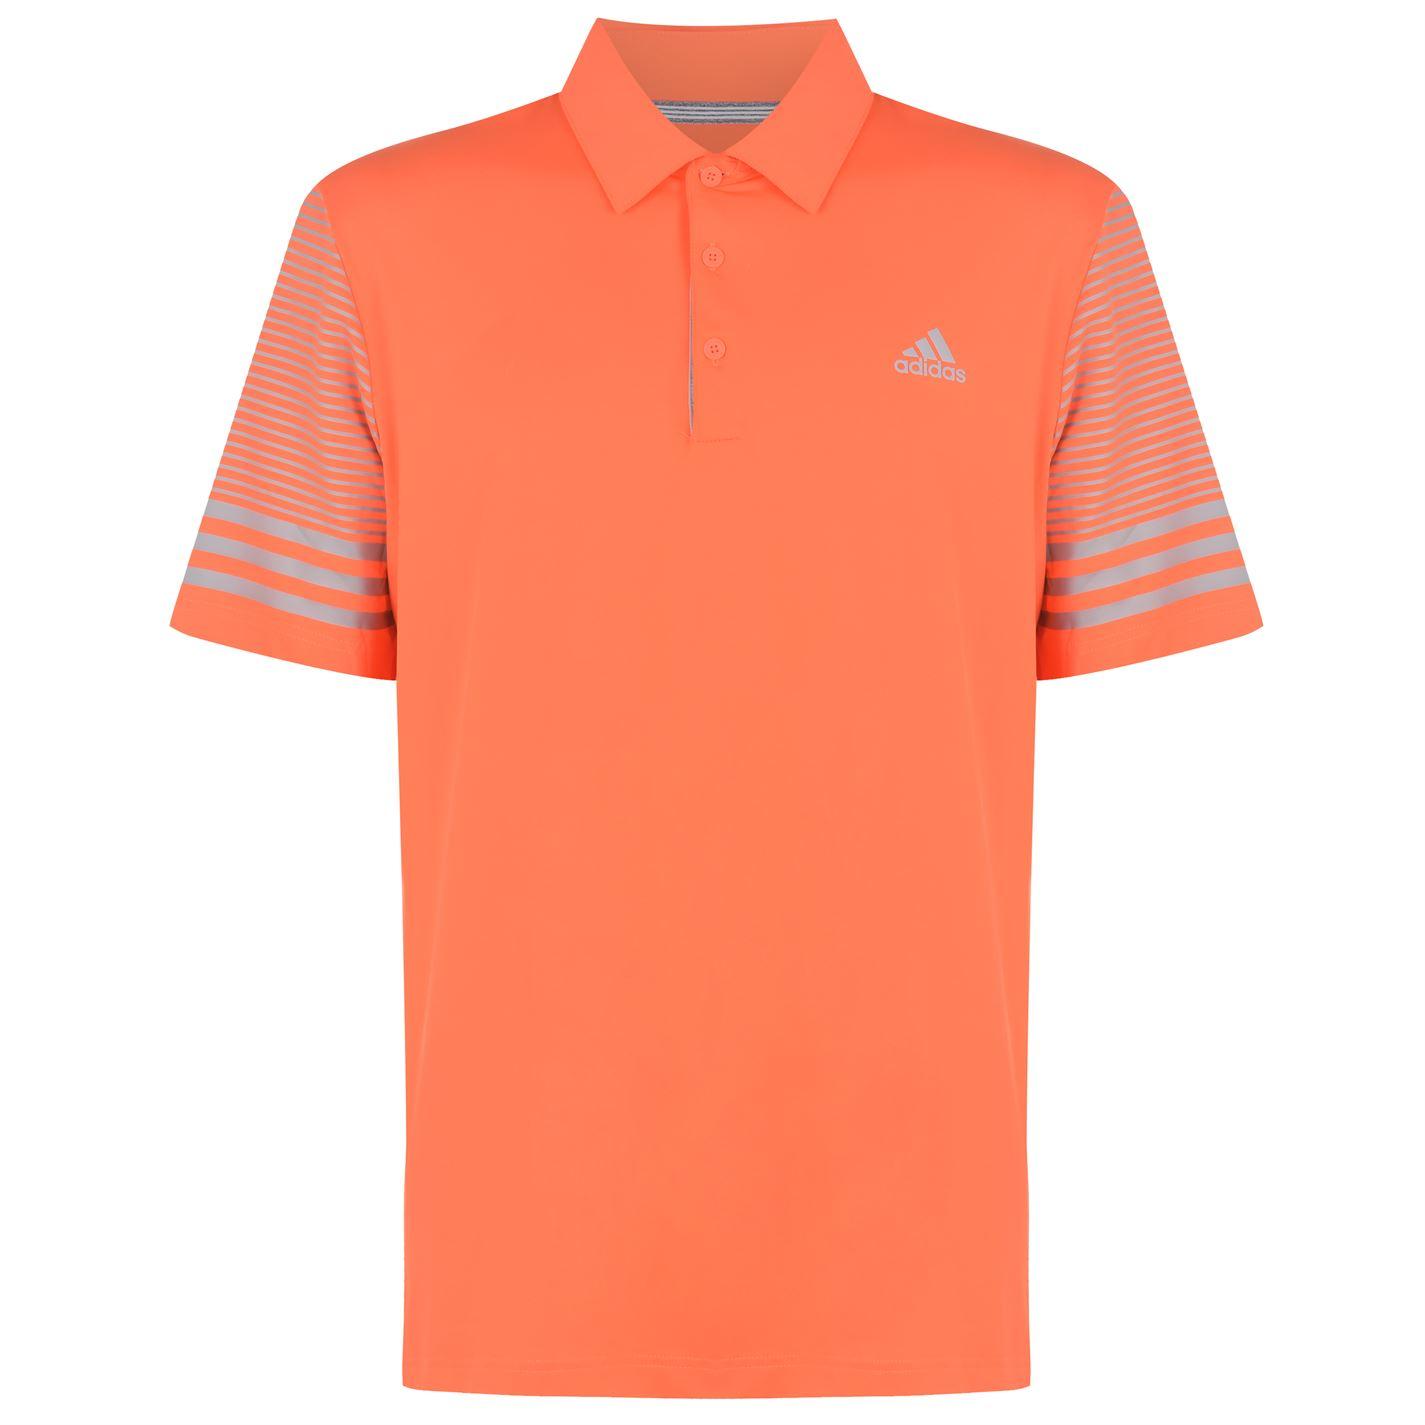 Adidas Ultimate365 Gradient Golf Polo Shirt Mens